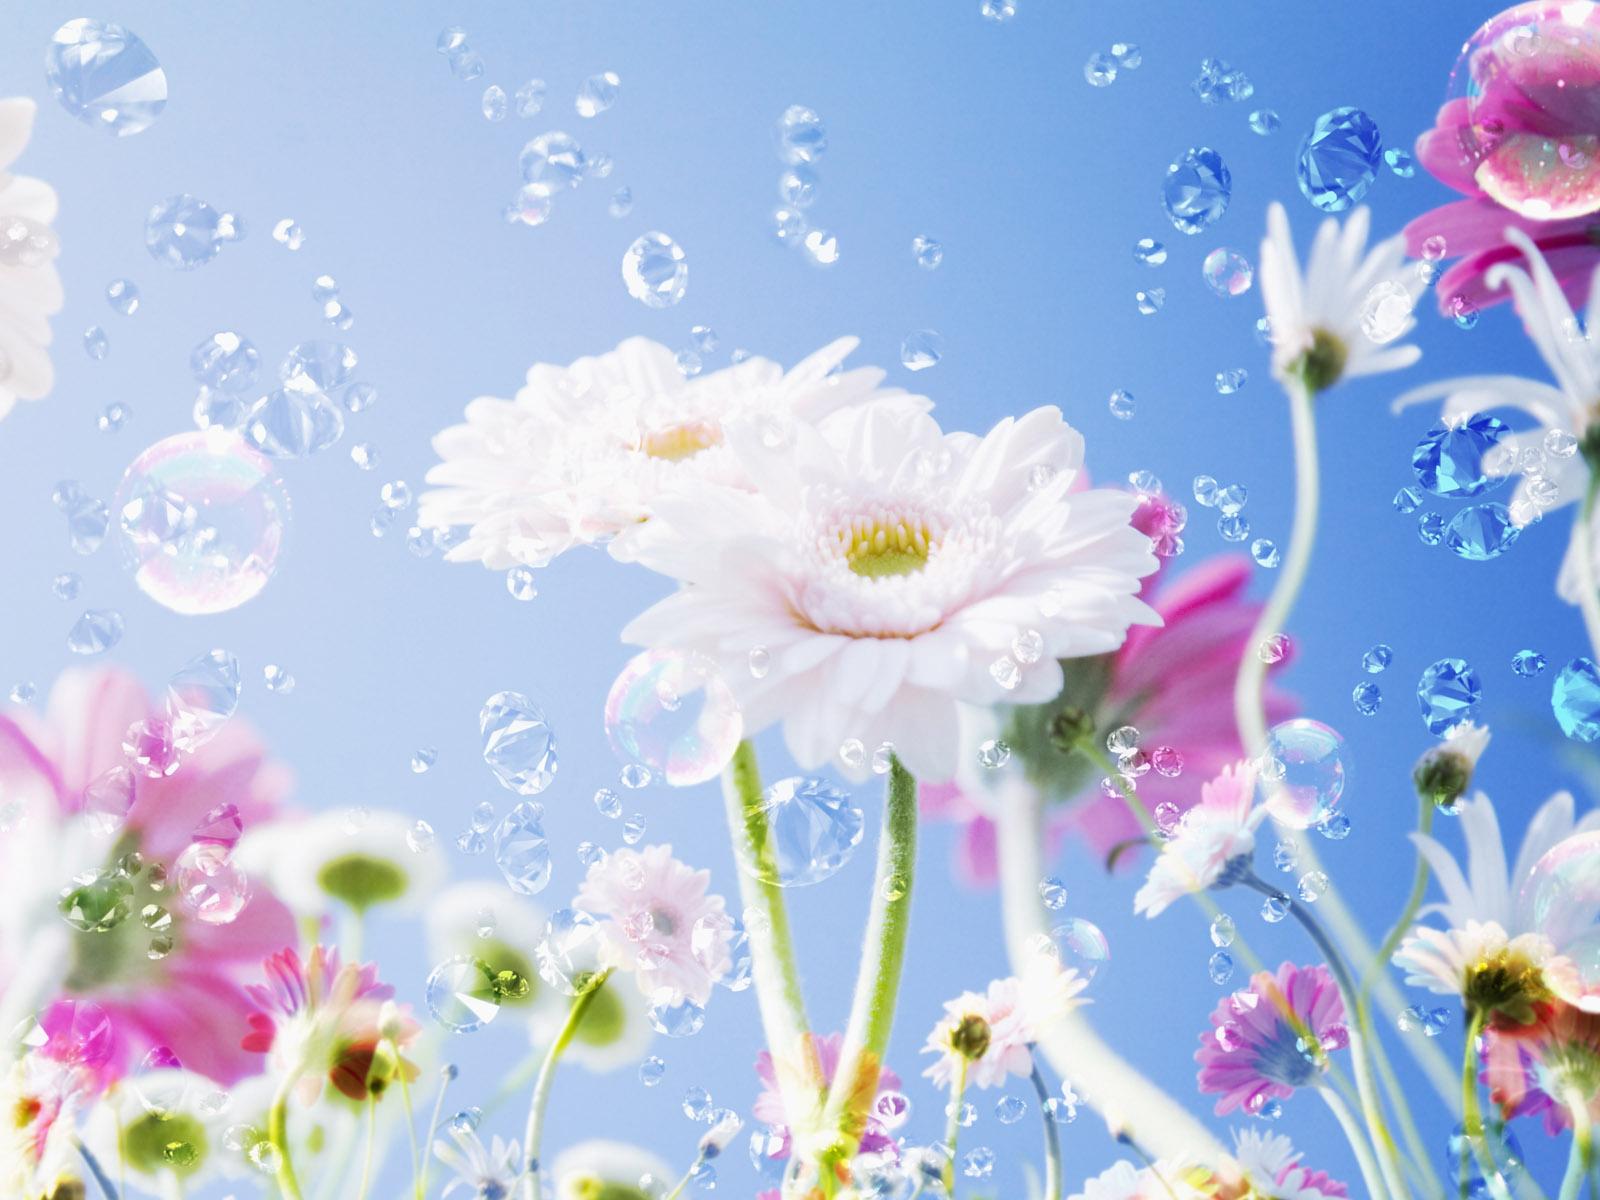 Pretty flower wallpaper wallpapersafari pretty flower backgrounds wallpaper wallpaper hd 1600x1200 voltagebd Gallery